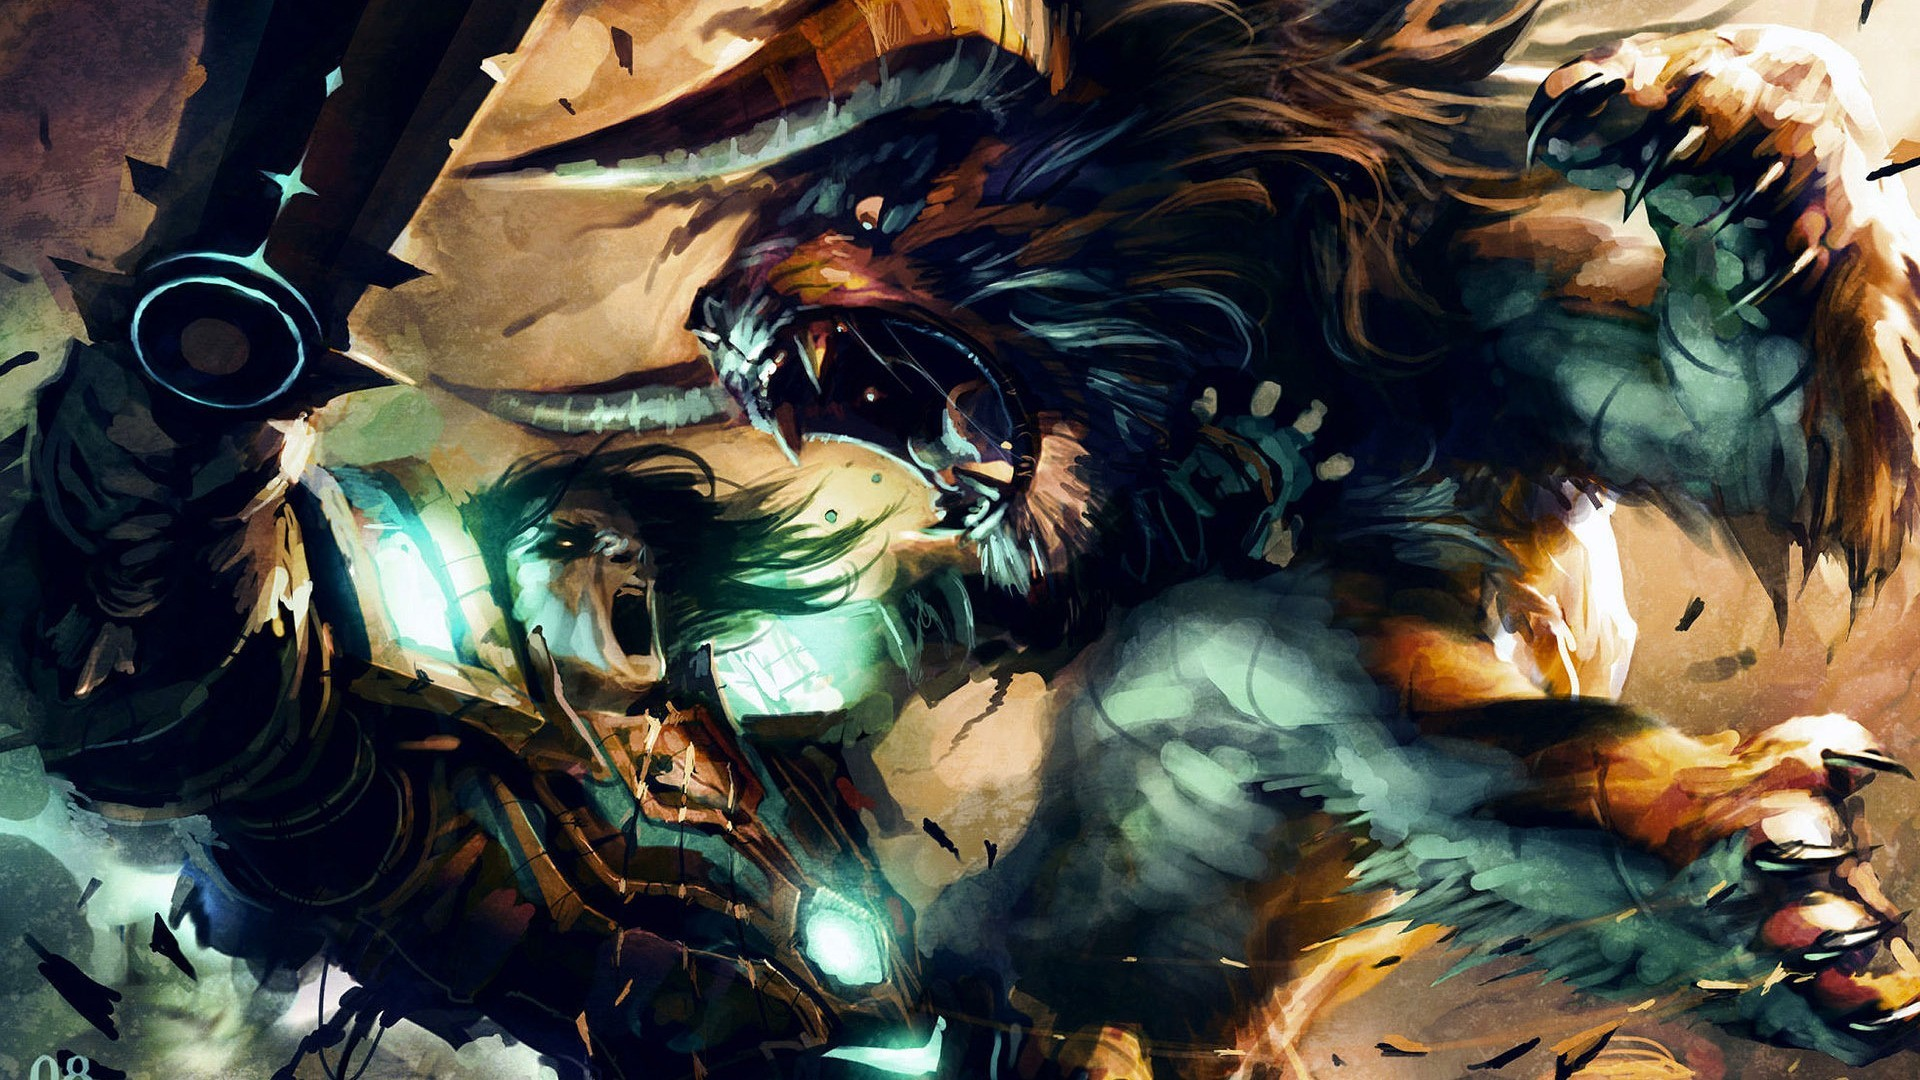 2011-03-31-388881.jpeg (1440×900) | Warcraft | Pinterest | Illustrations